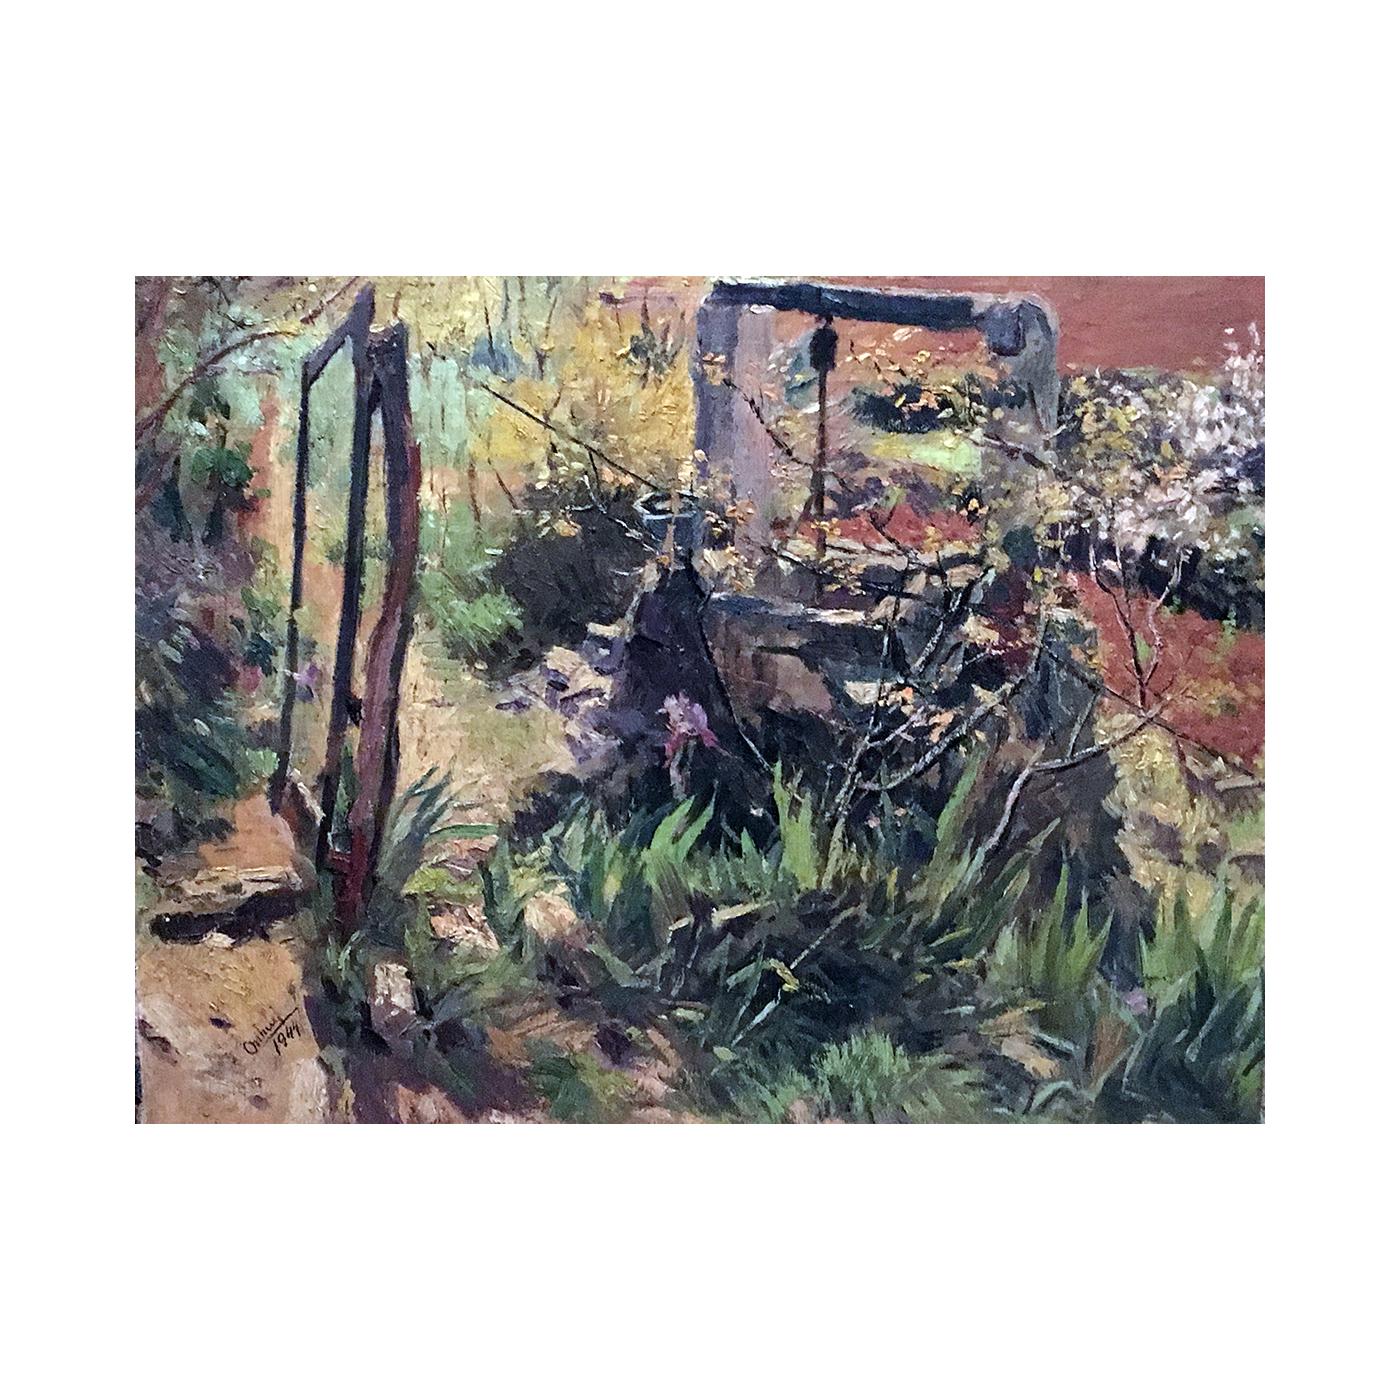 Juan Orihuel [1906-1982] Argentine Artist : The garden well, 1944.